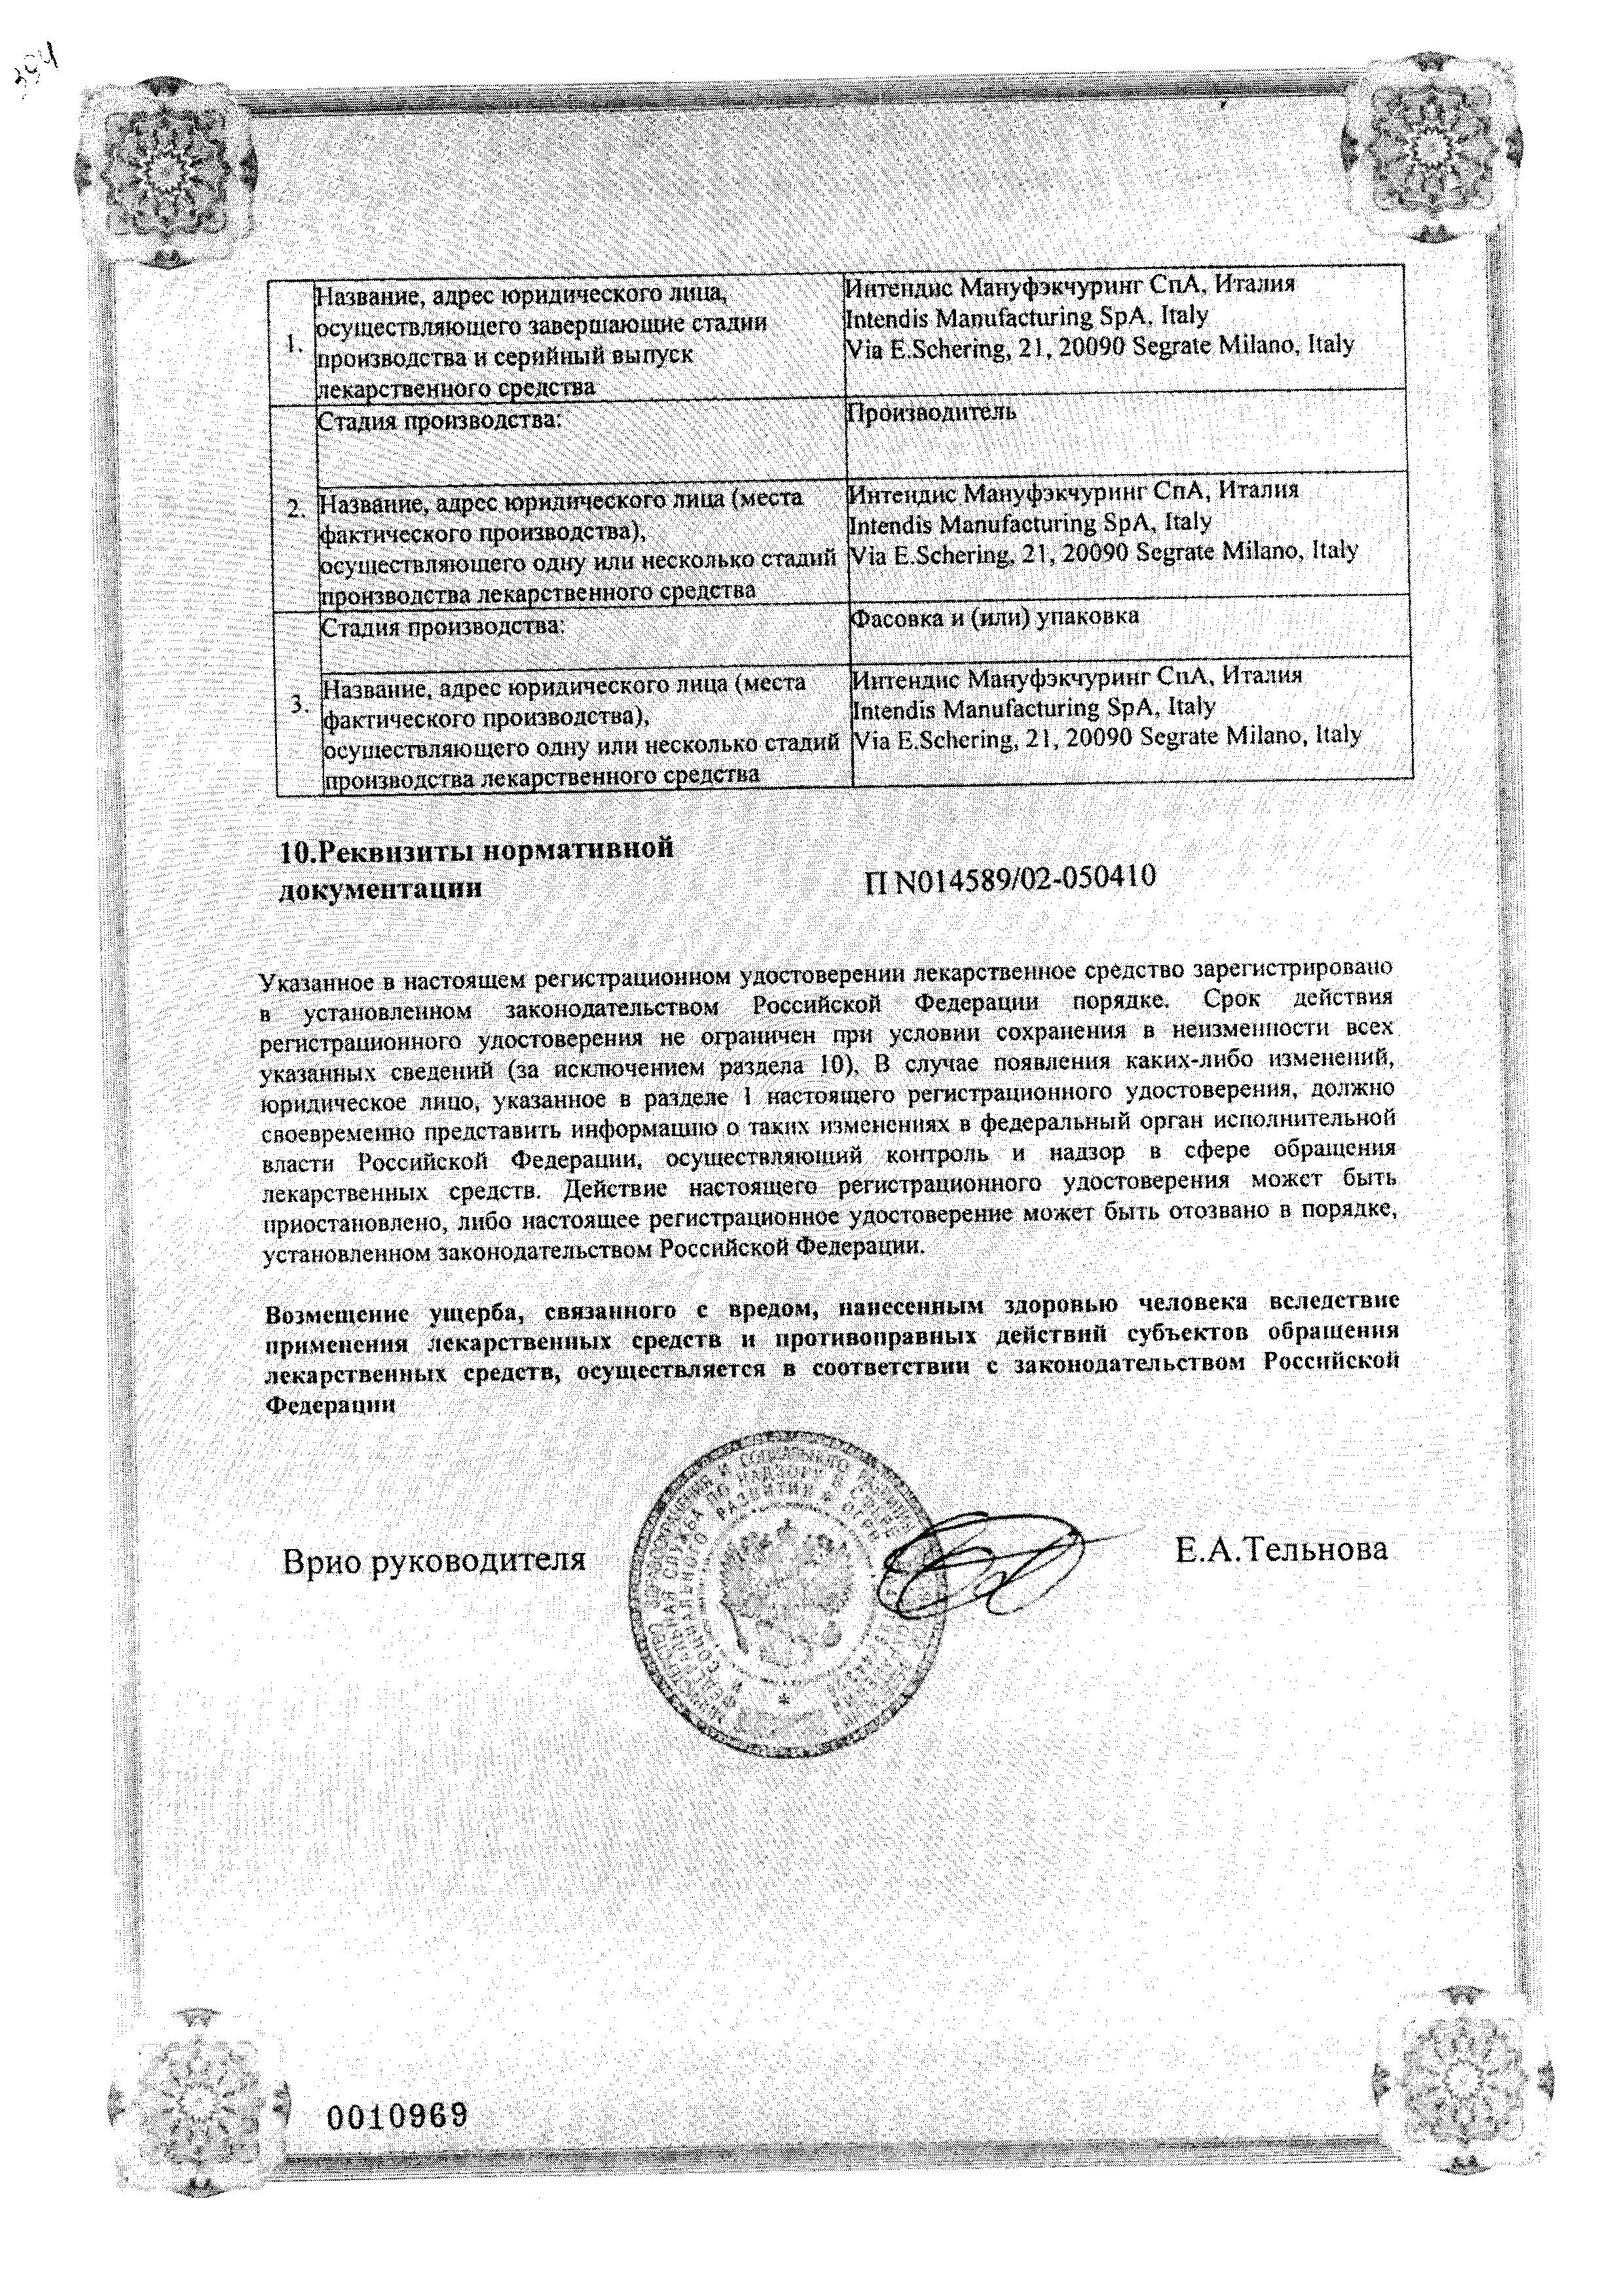 Скинорен сертификат